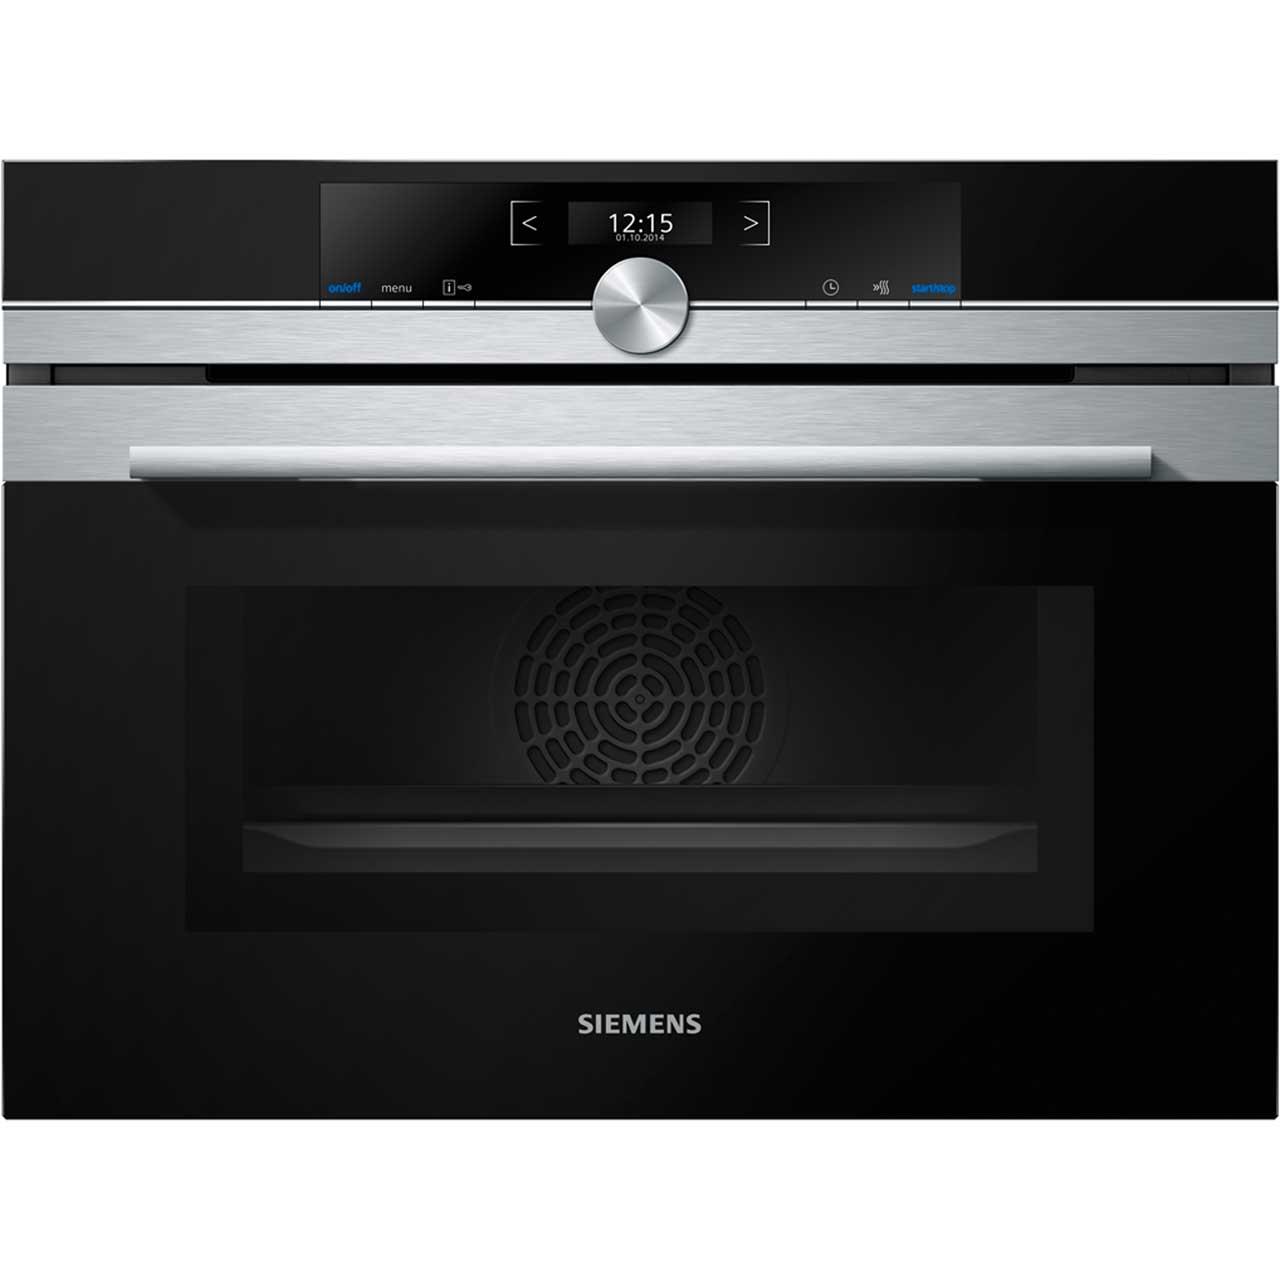 Siemens iq 700 cm633gbs1b built in combination microwave for Siemens iq 700